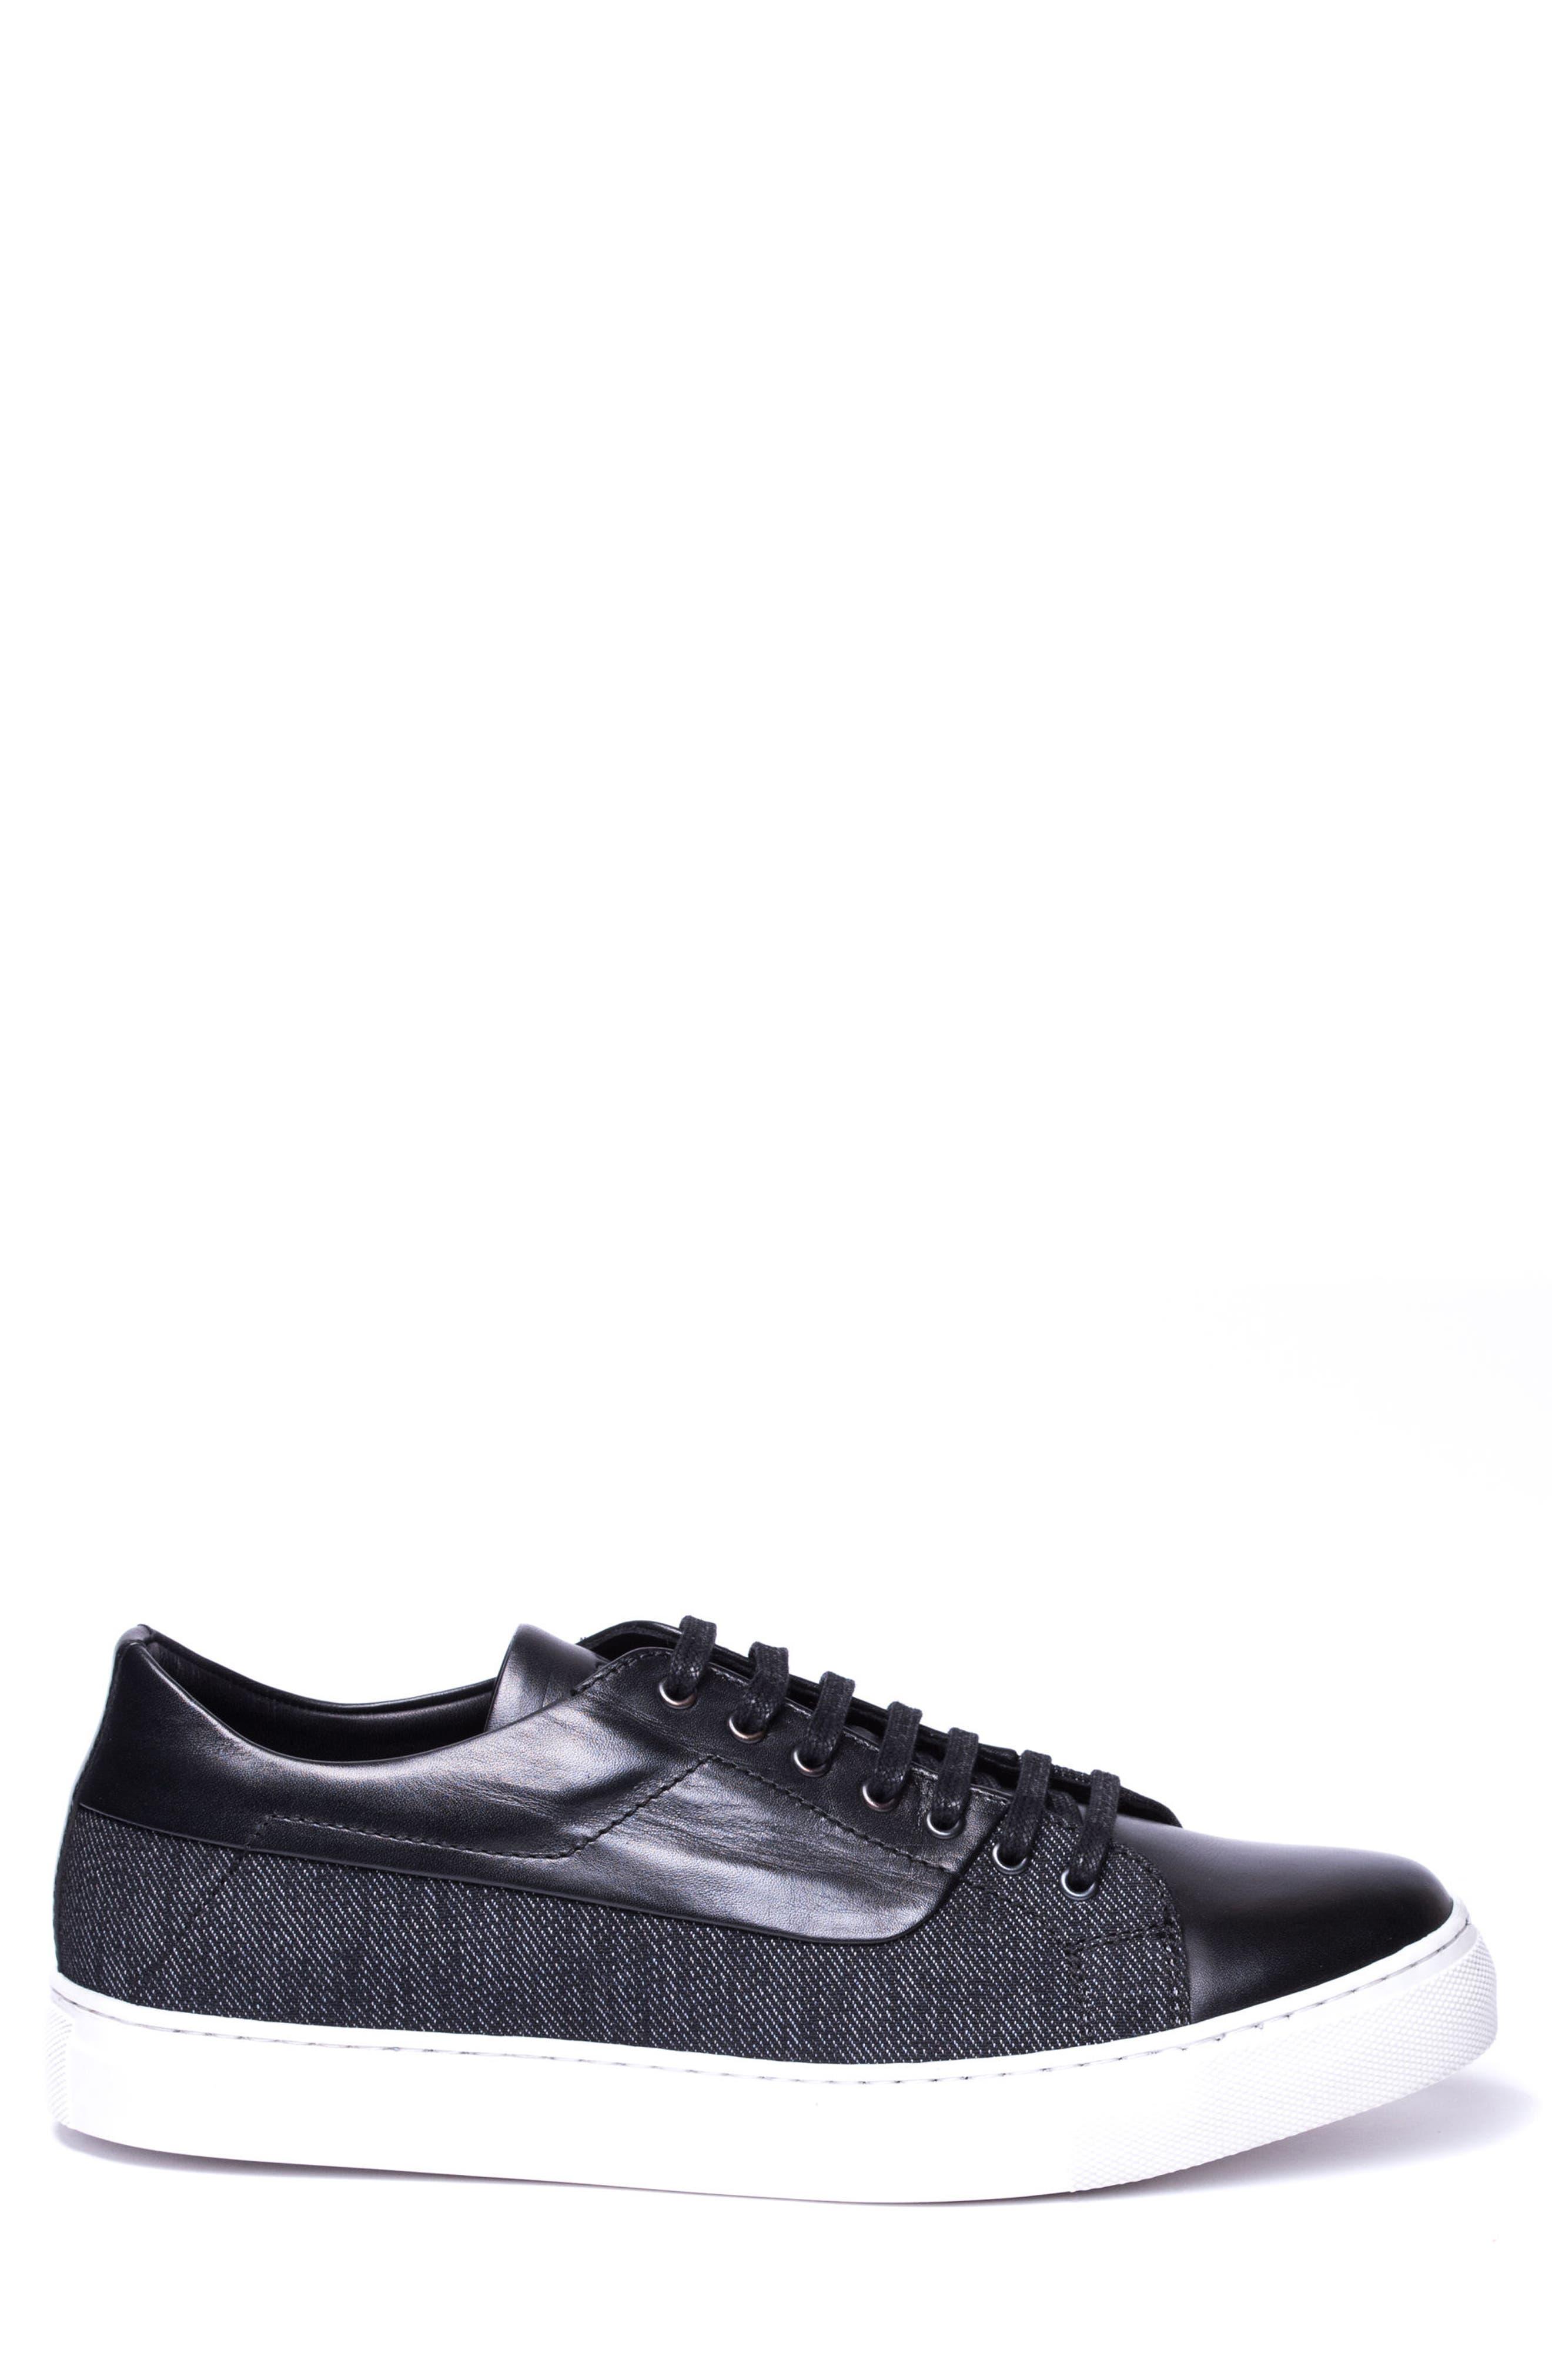 Luke Low Top Sneaker,                             Alternate thumbnail 3, color,                             Black Leather